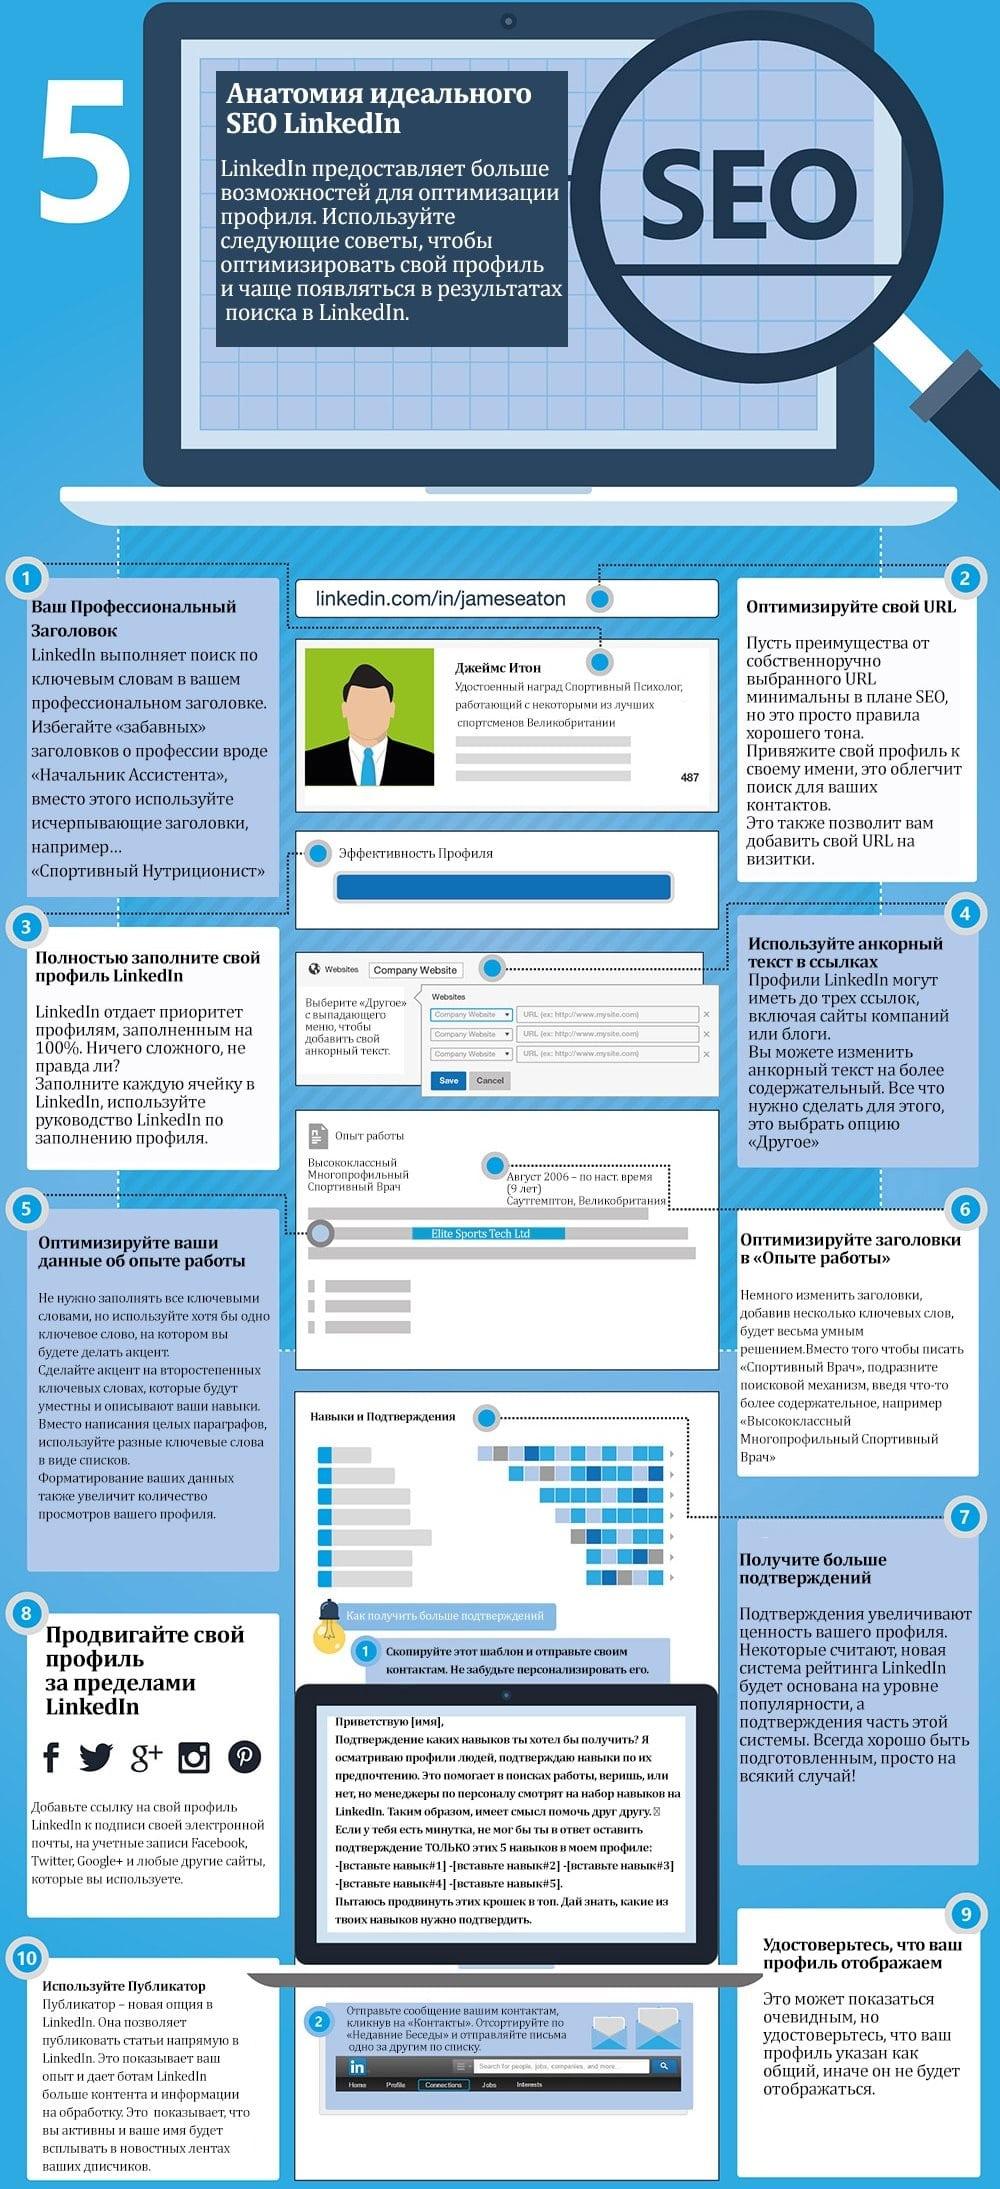 SEO-продвижение профиля в LinkedIn